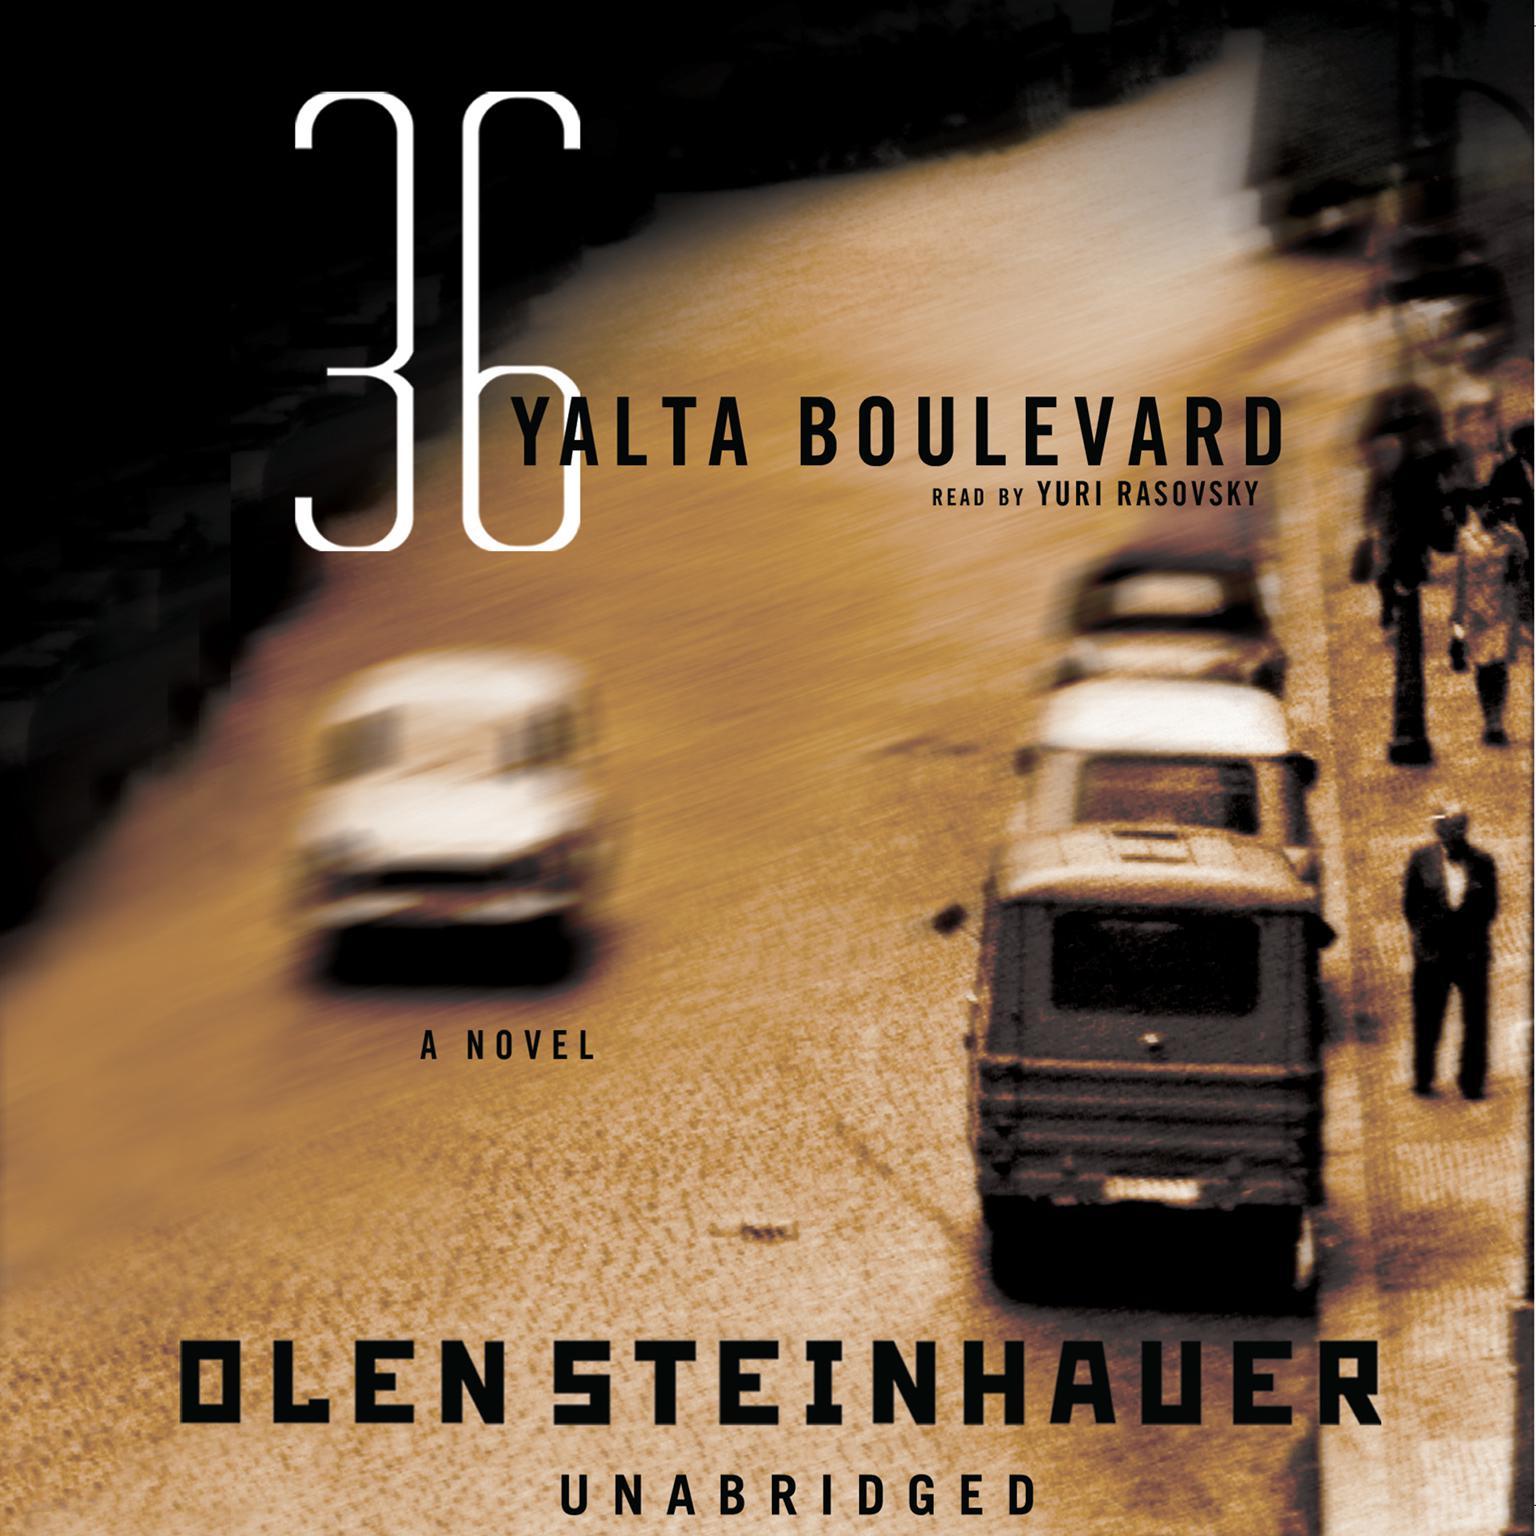 Printable 36 Yalta Boulevard: A Novel Audiobook Cover Art